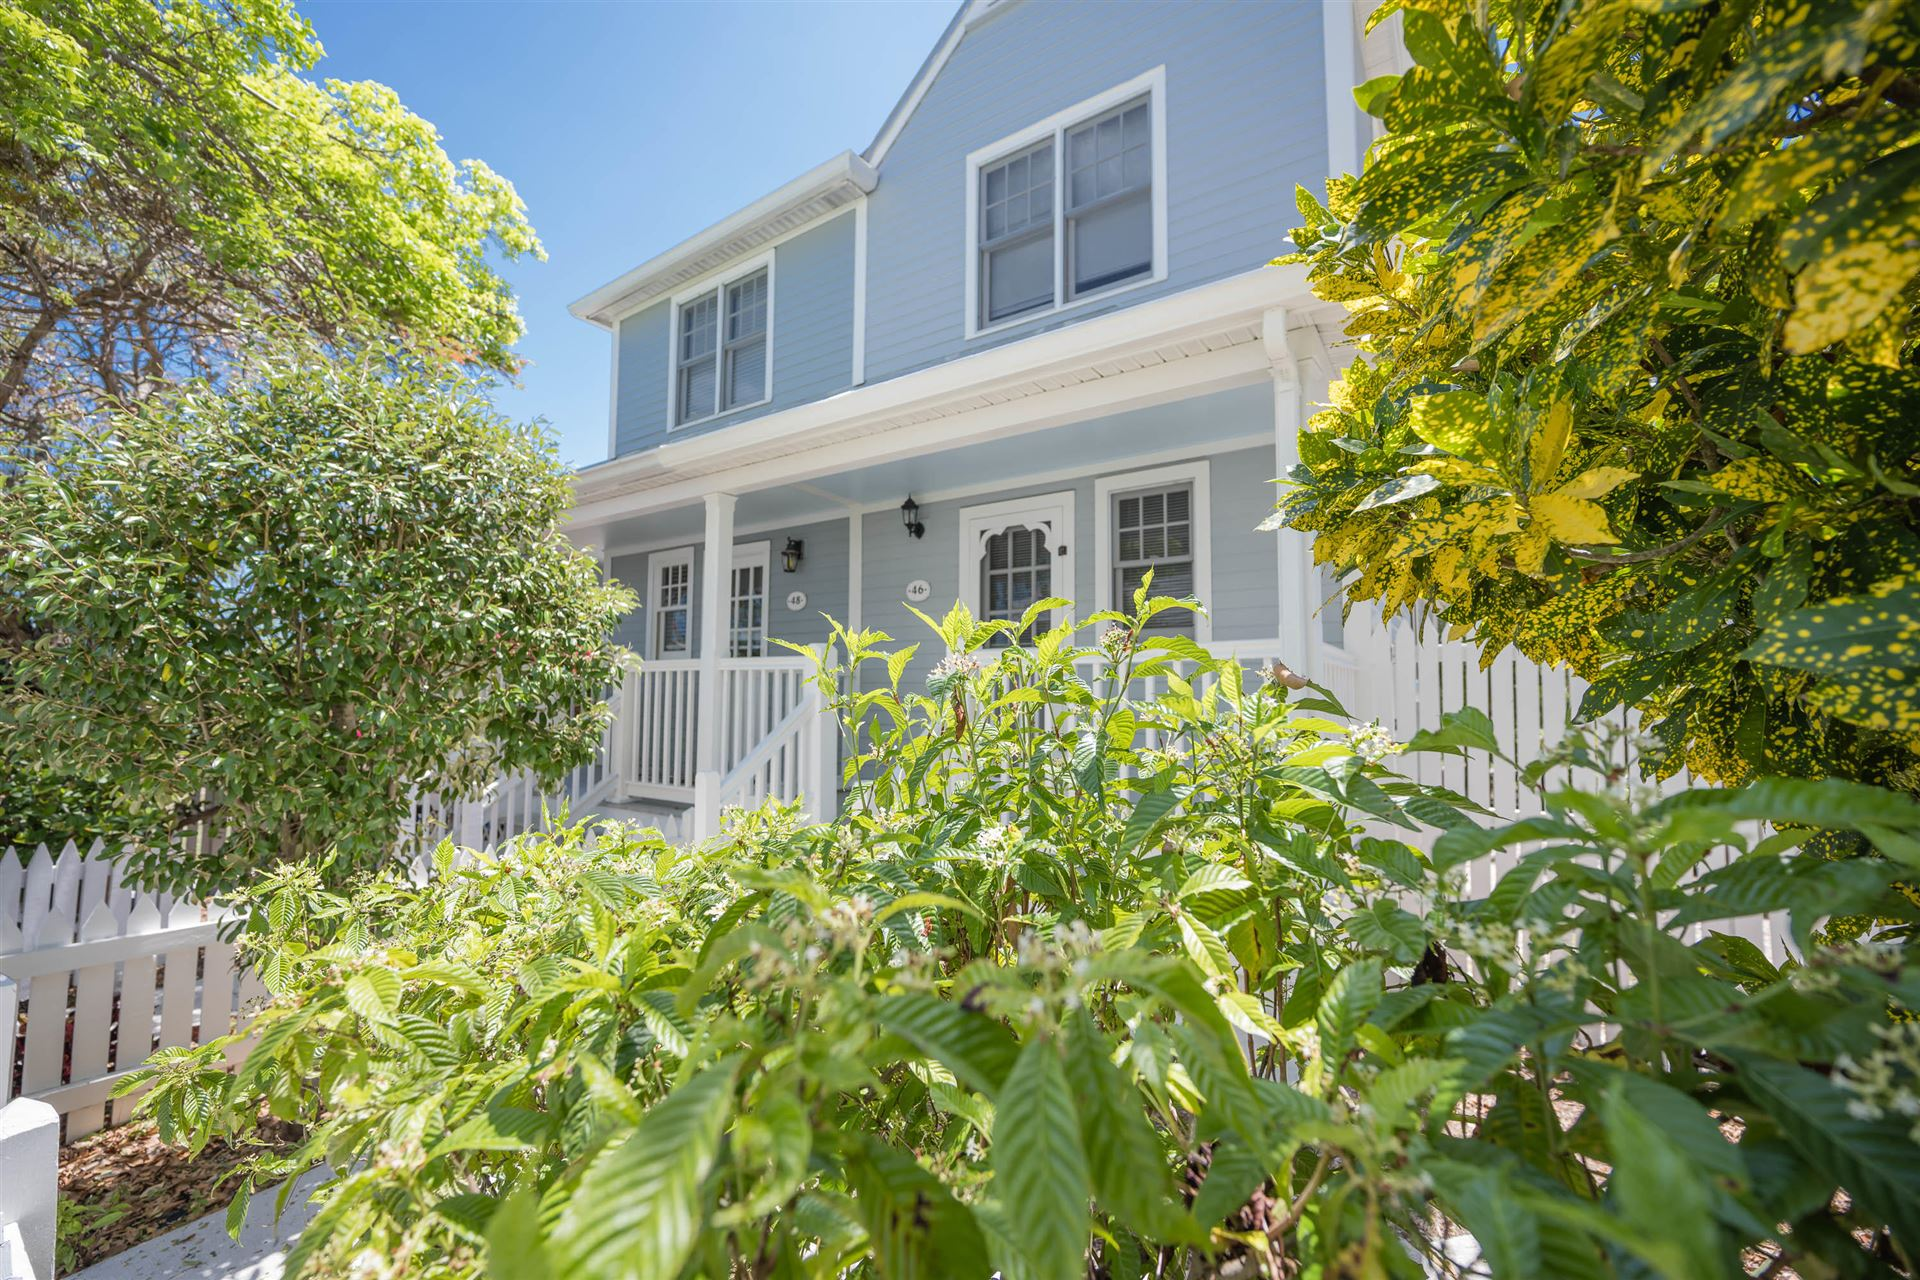 46 Kingfisher Lane, Key West, FL 33040 - #: 595449